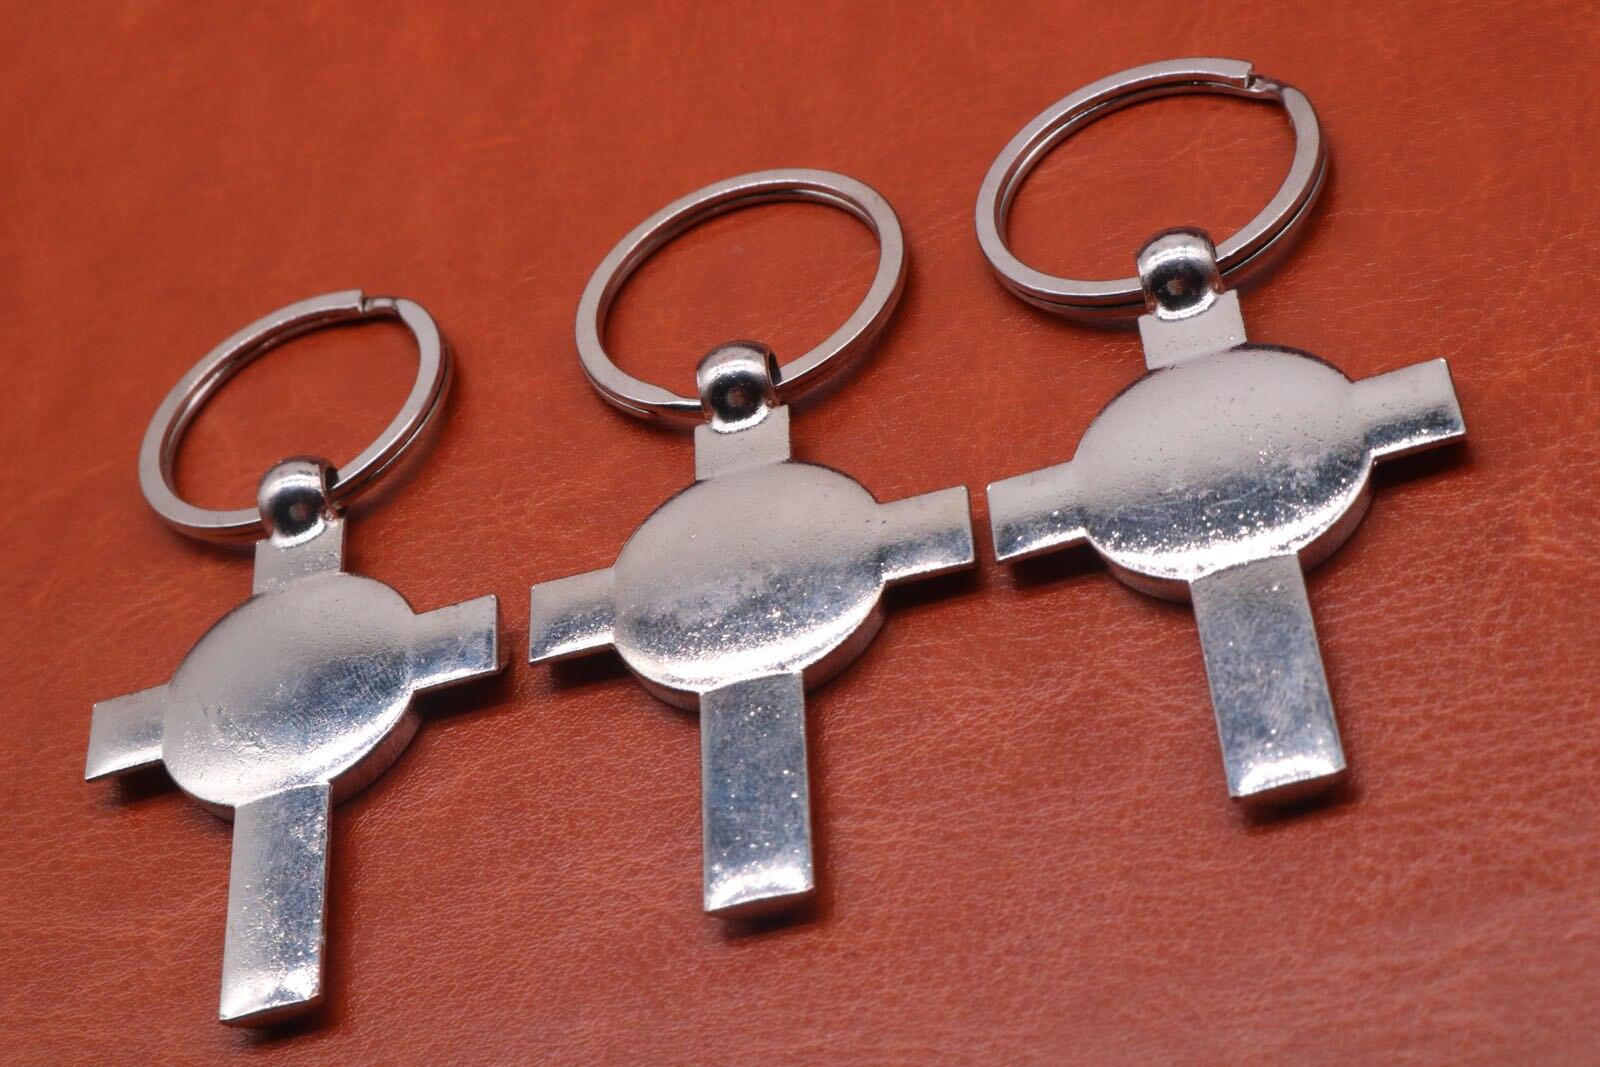 Religious cross key ring, virgin Marie key, Jesus Christ cross key spoon car accessories, free shipping.